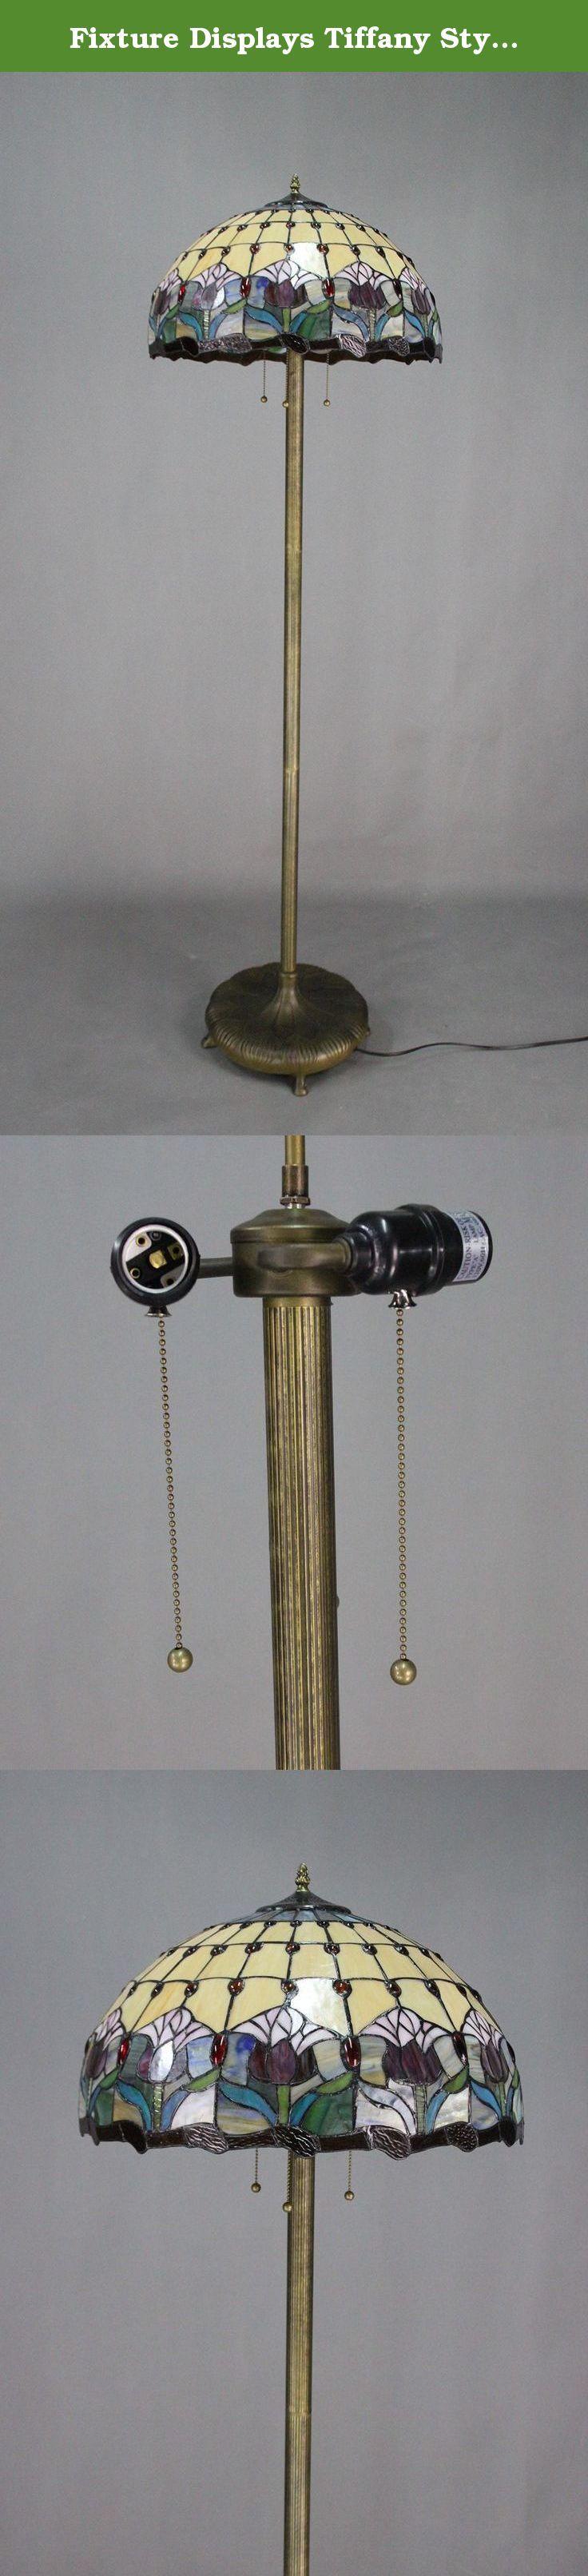 Fixture Displays Tiffany Style Elegant Floor Lamp 20-Inch Shade 16059. Fixture Displays Tiffany Style Elegant Floor Lamp 20-Inch Shade 16059.